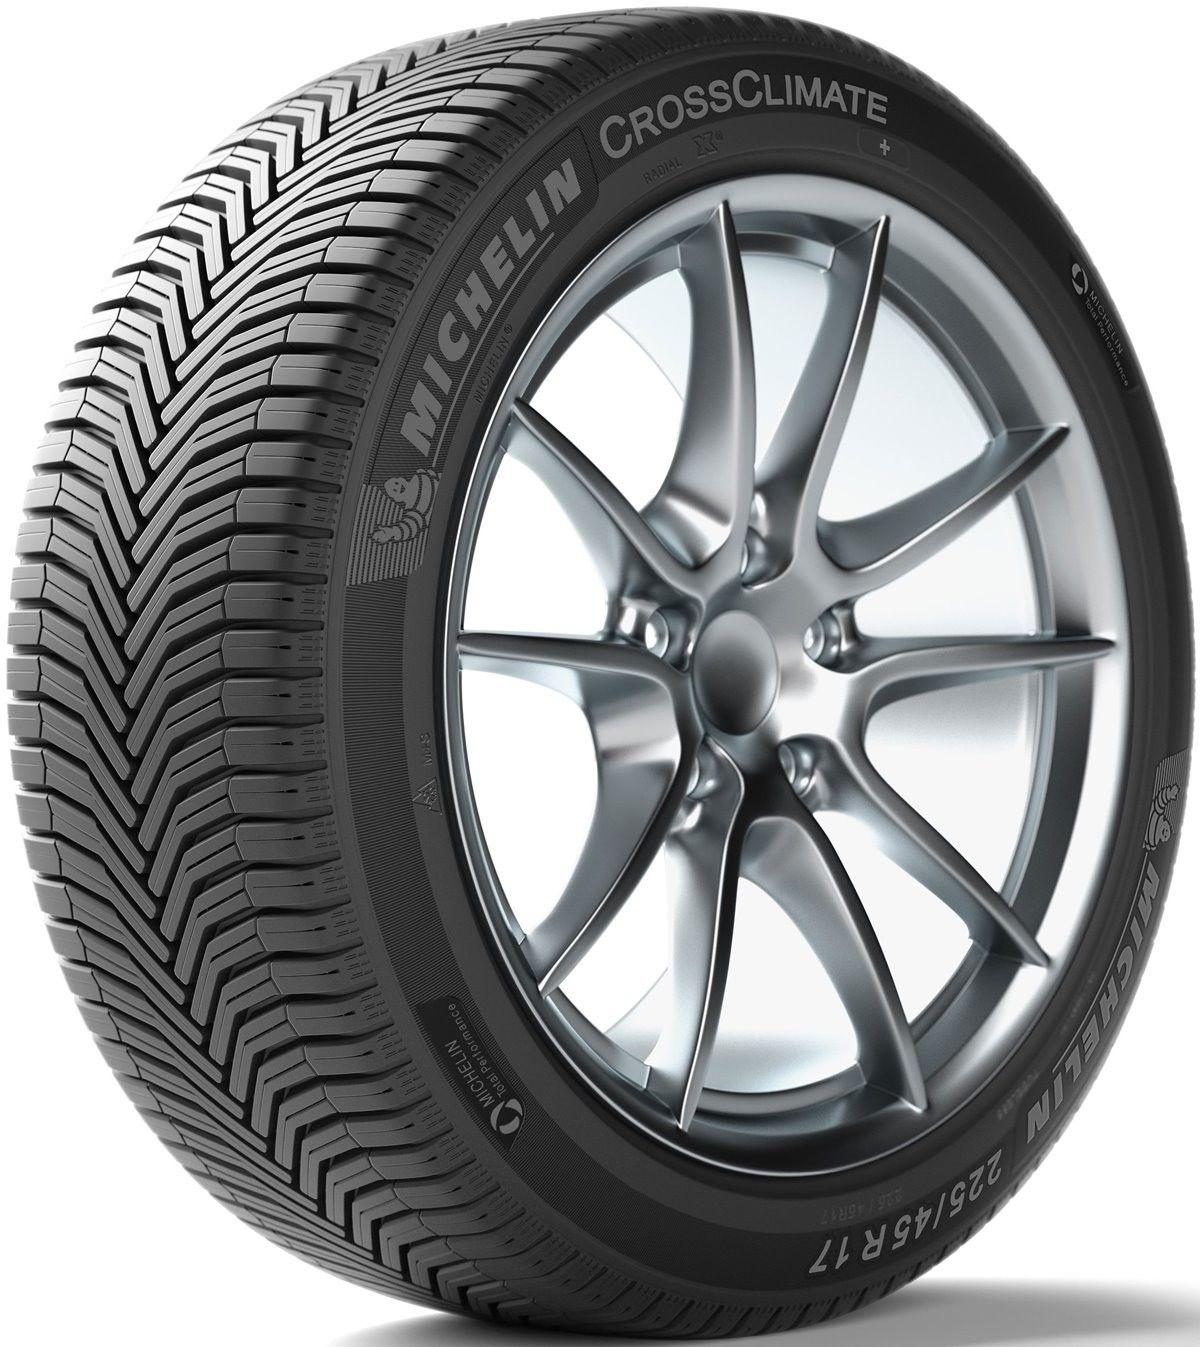 Michelin CROSSCLIMATE 185/65 R15 92 V